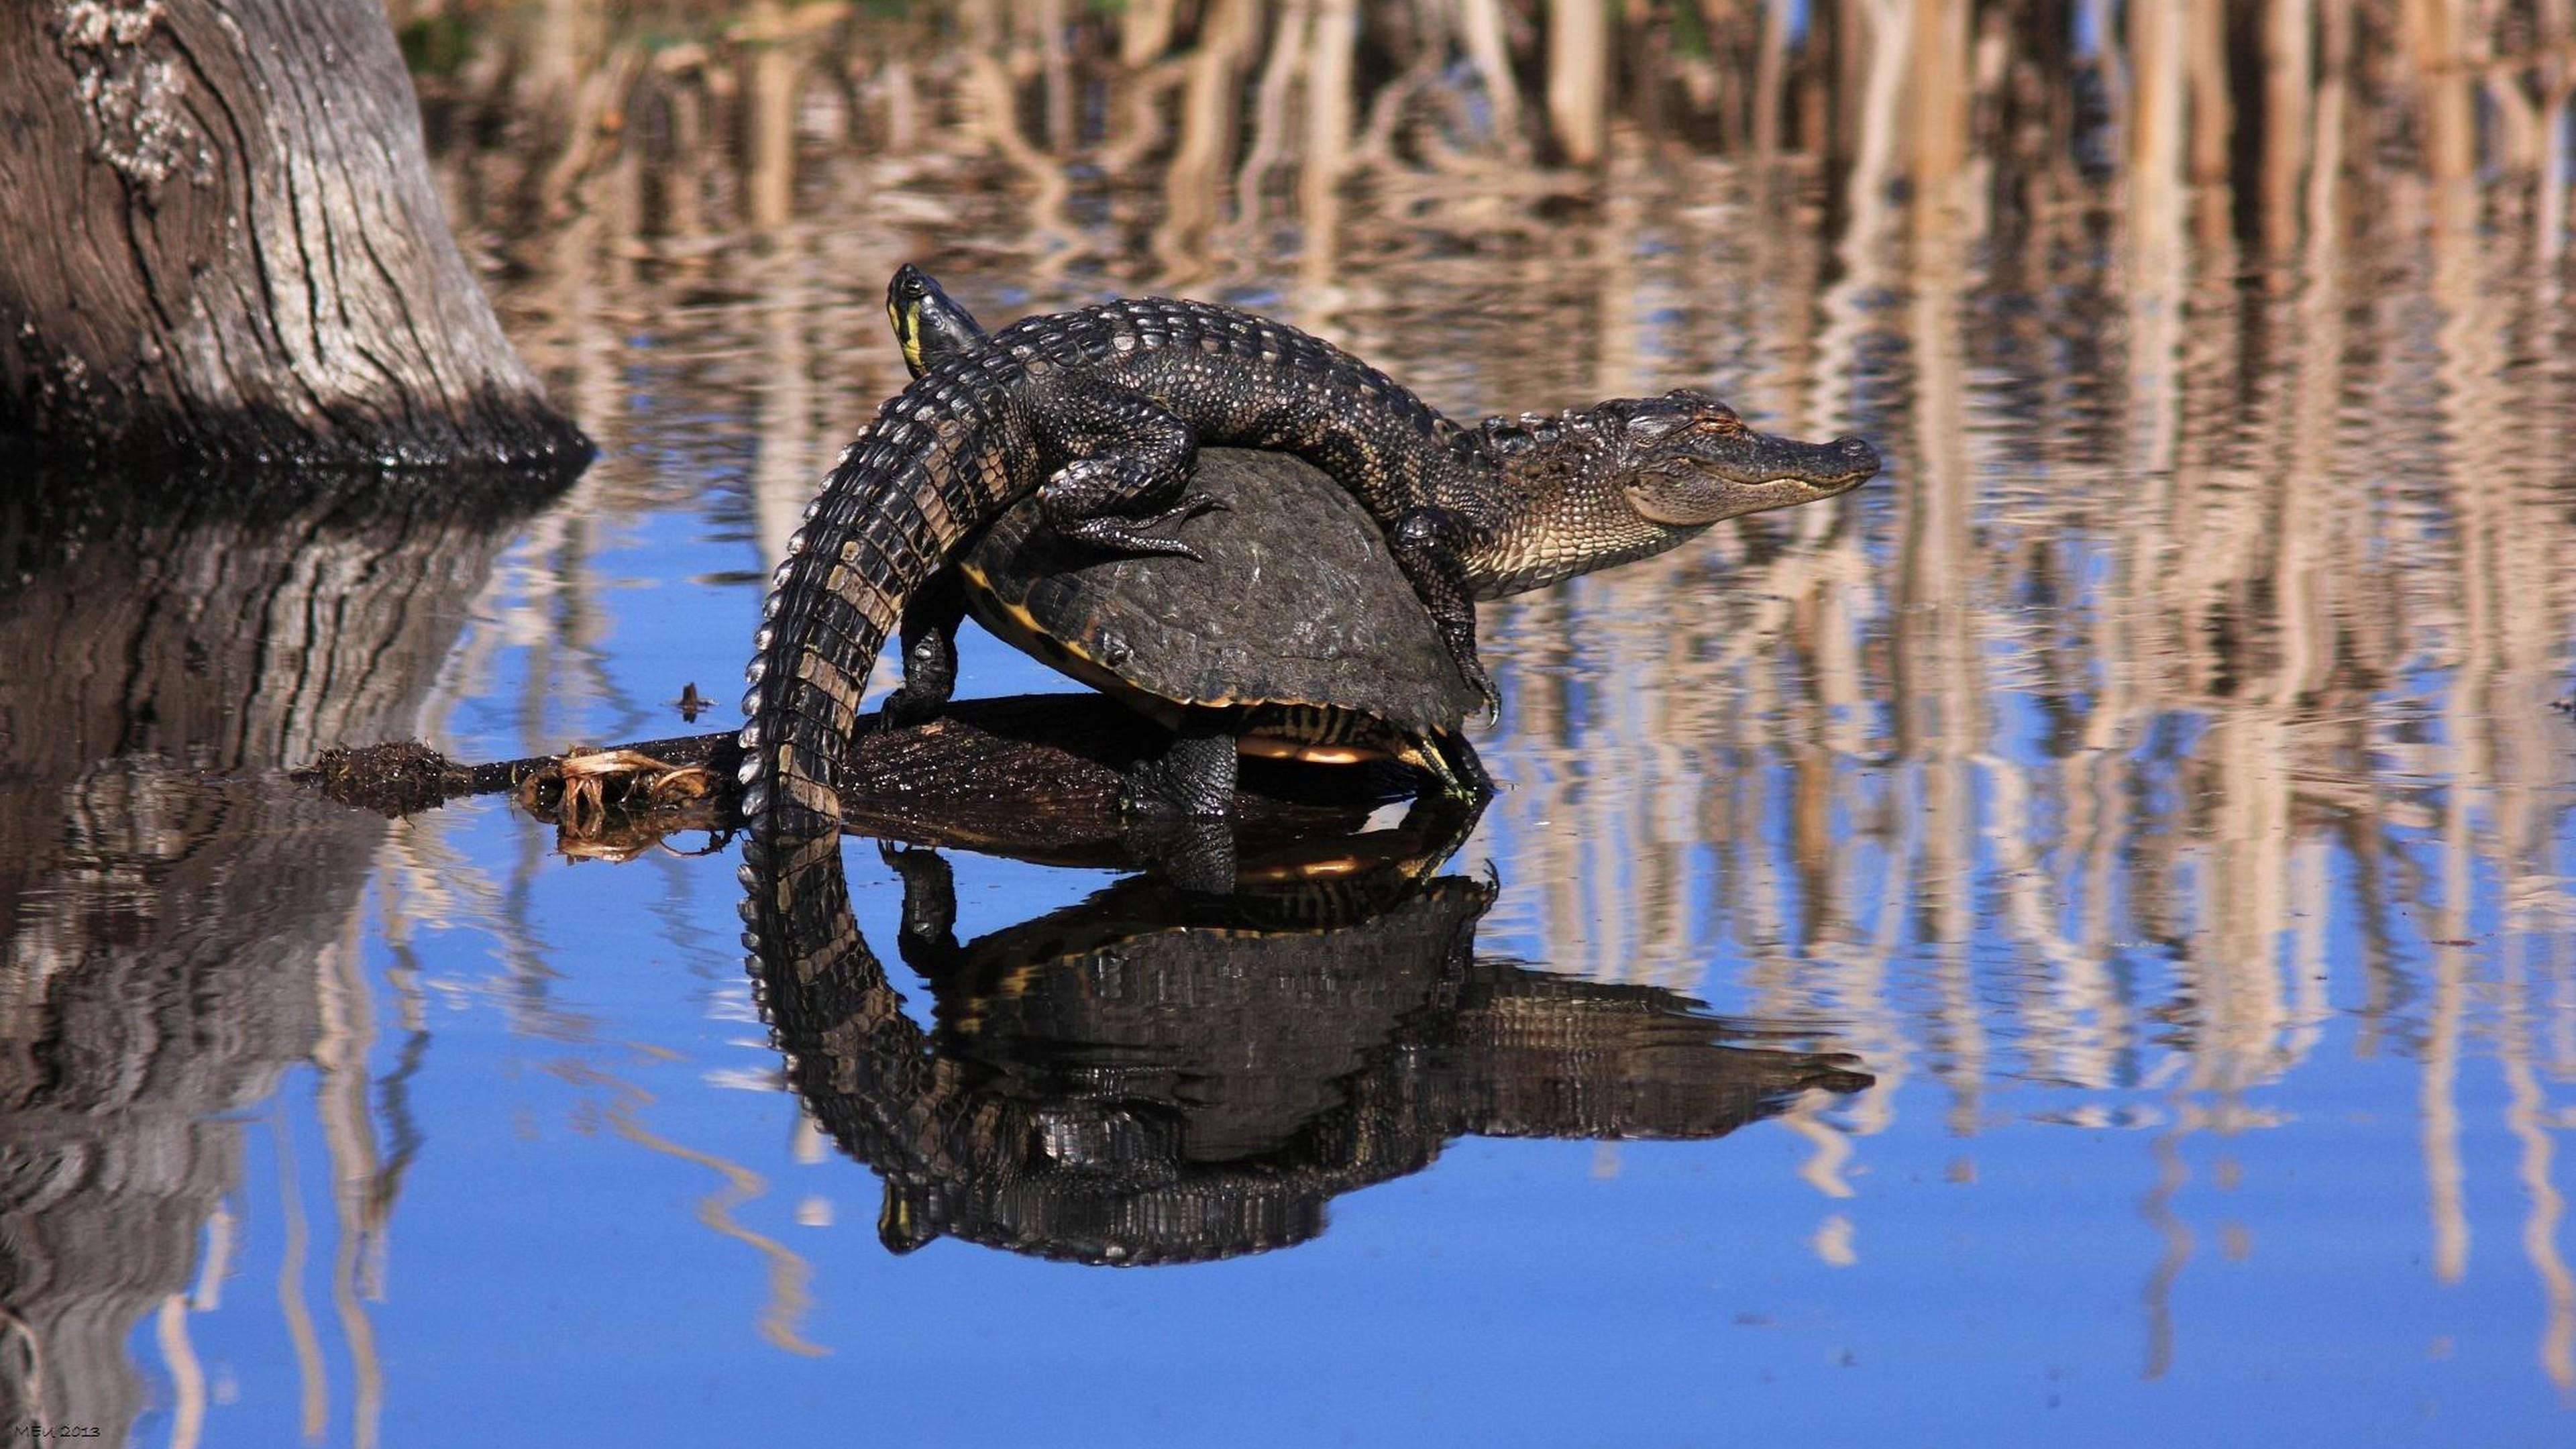 Alligator and tortuga